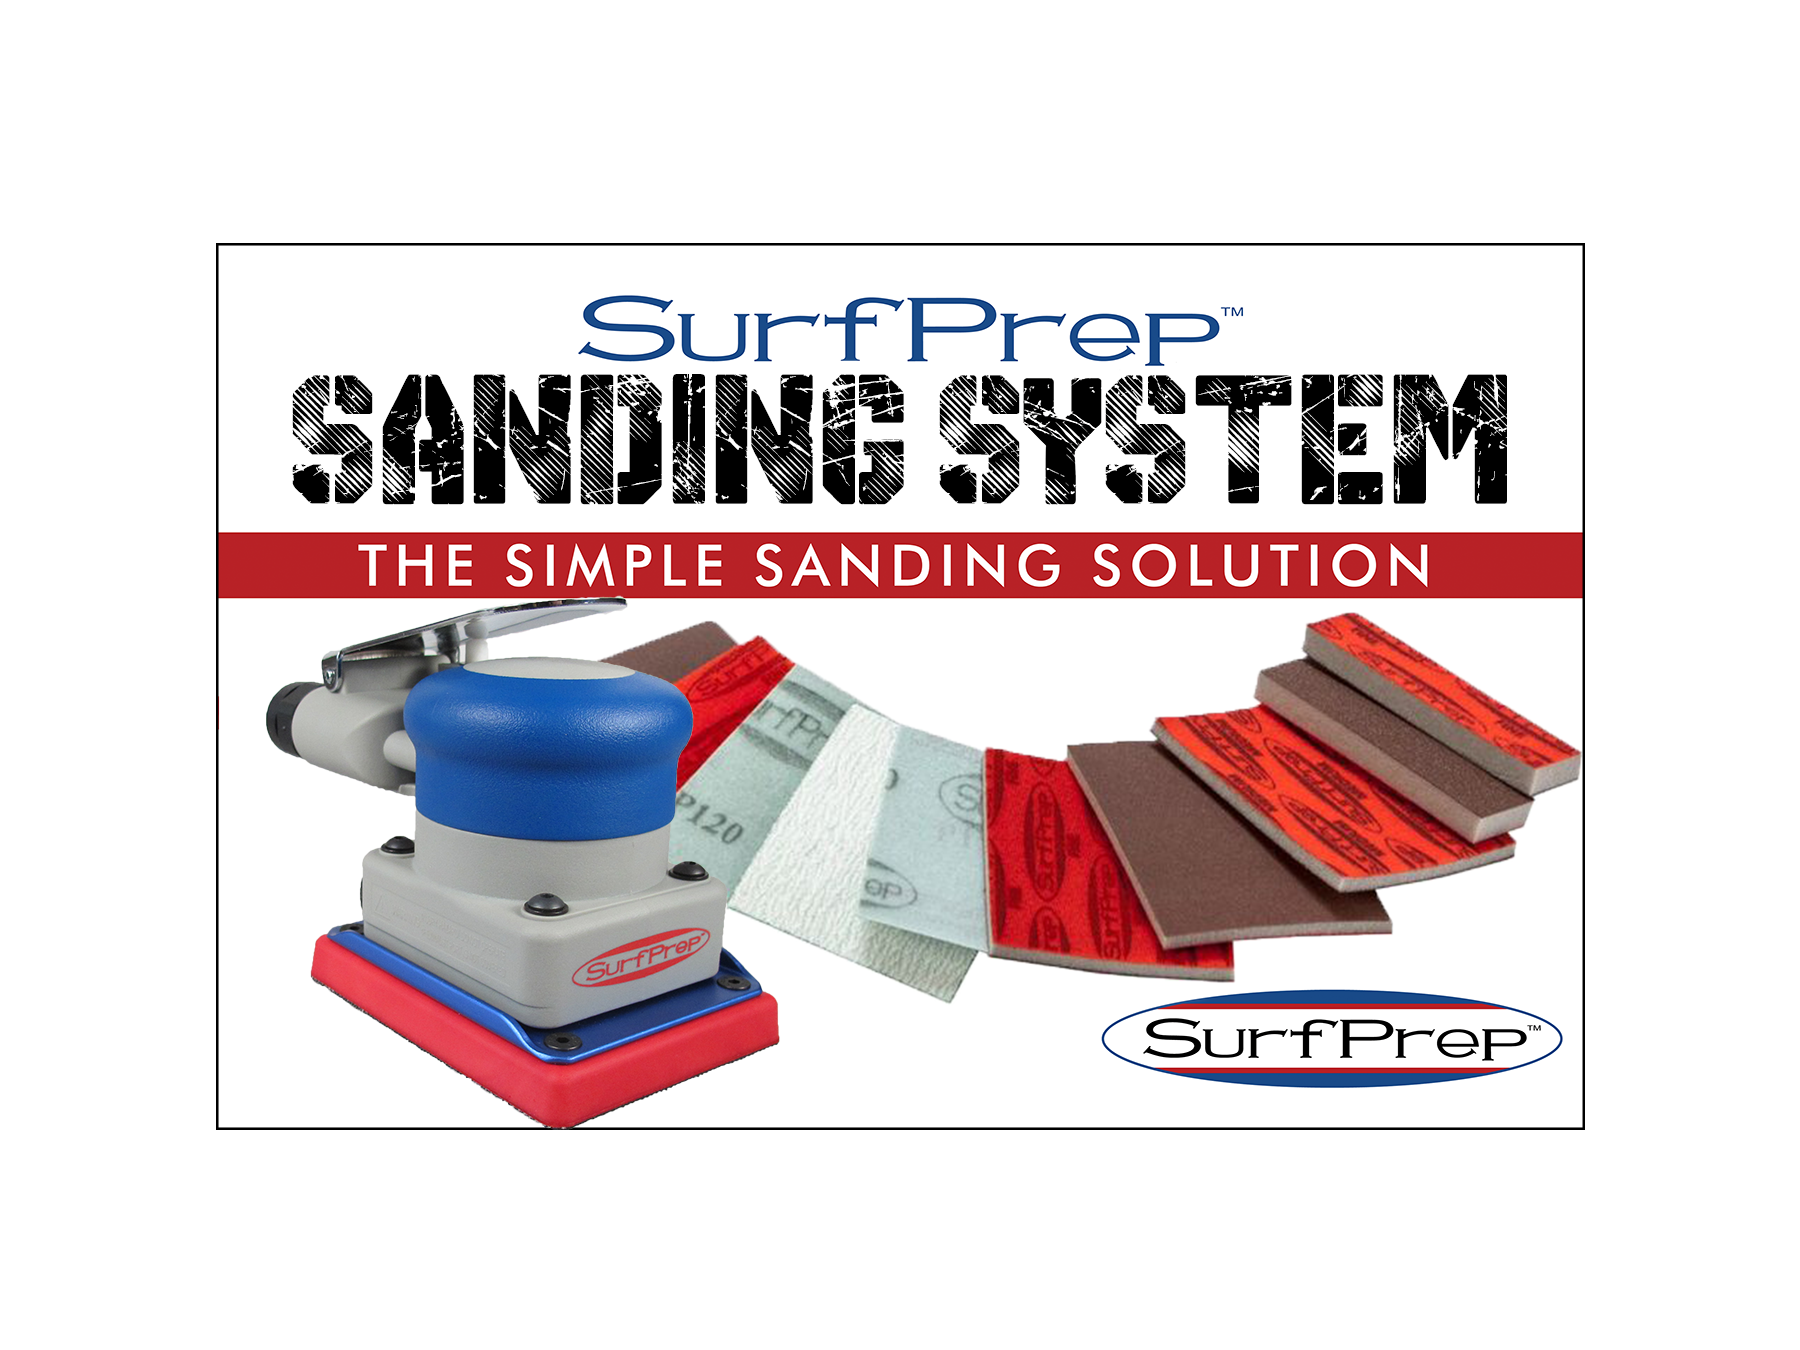 Sanding Systems 3x4 Air Orbital Sander SPSS3x4